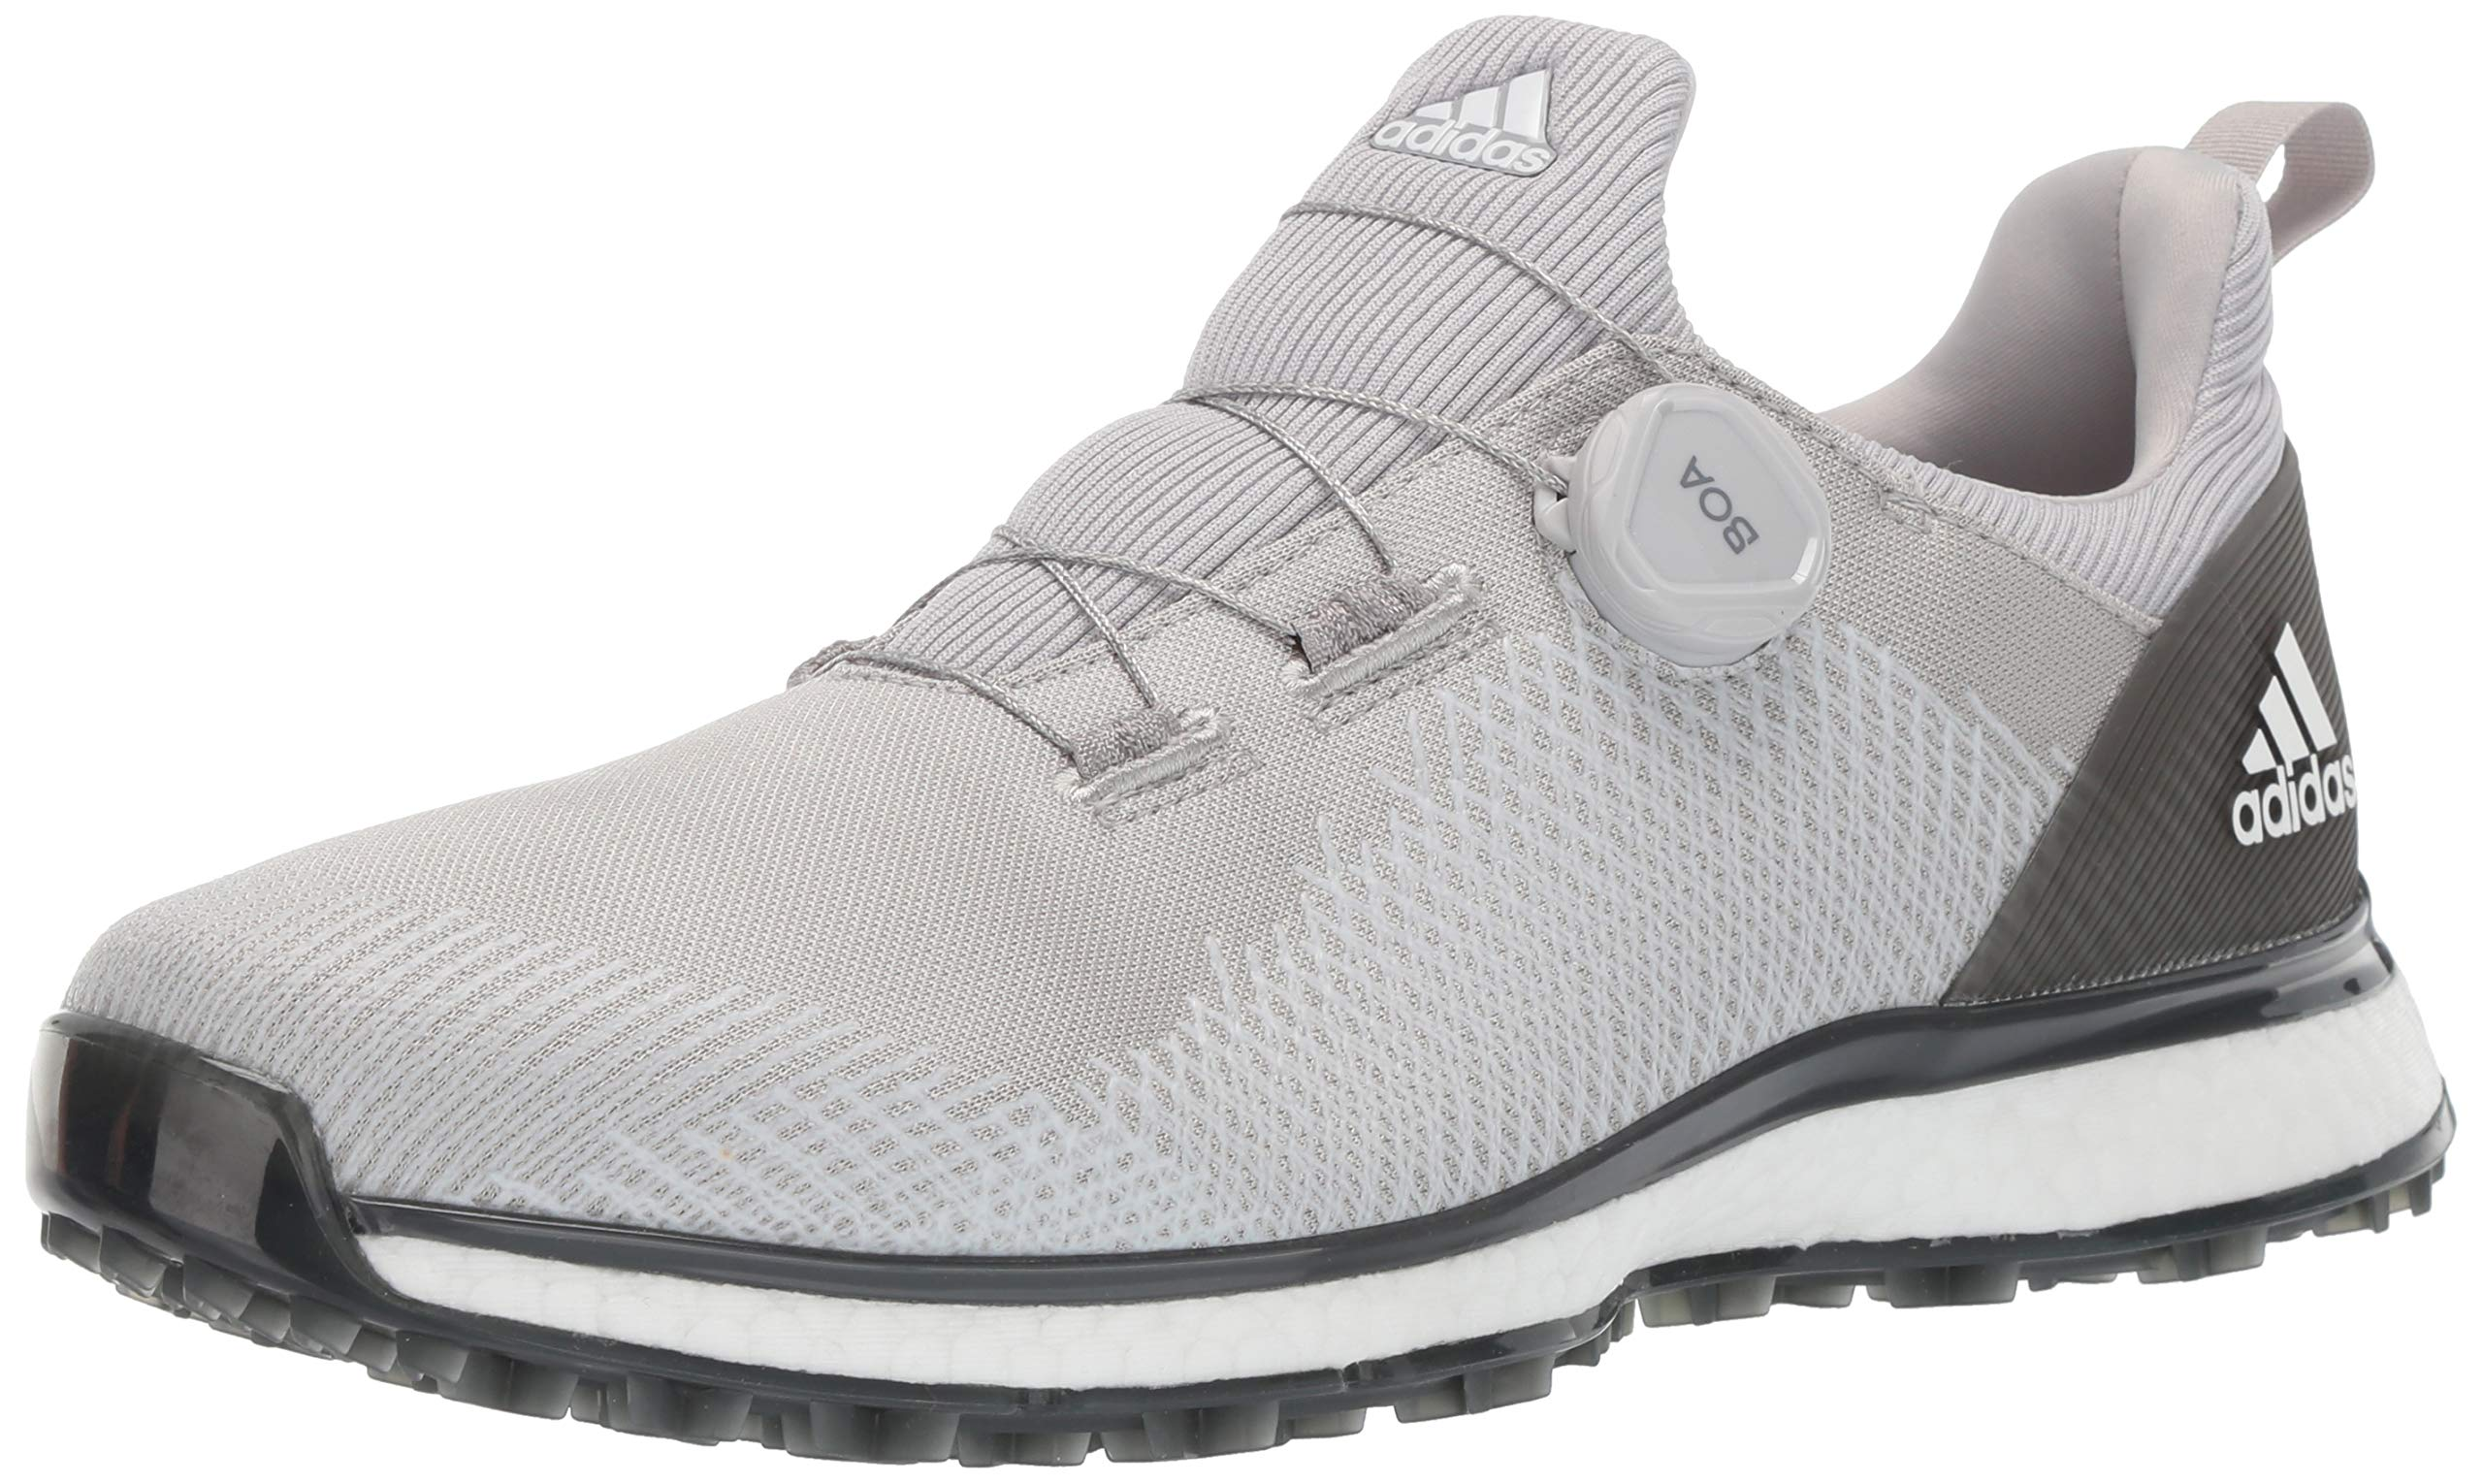 adidas Men's FORGEFIBER BOA Golf Shoe Two/FTWR White/Grey six, 7 M US